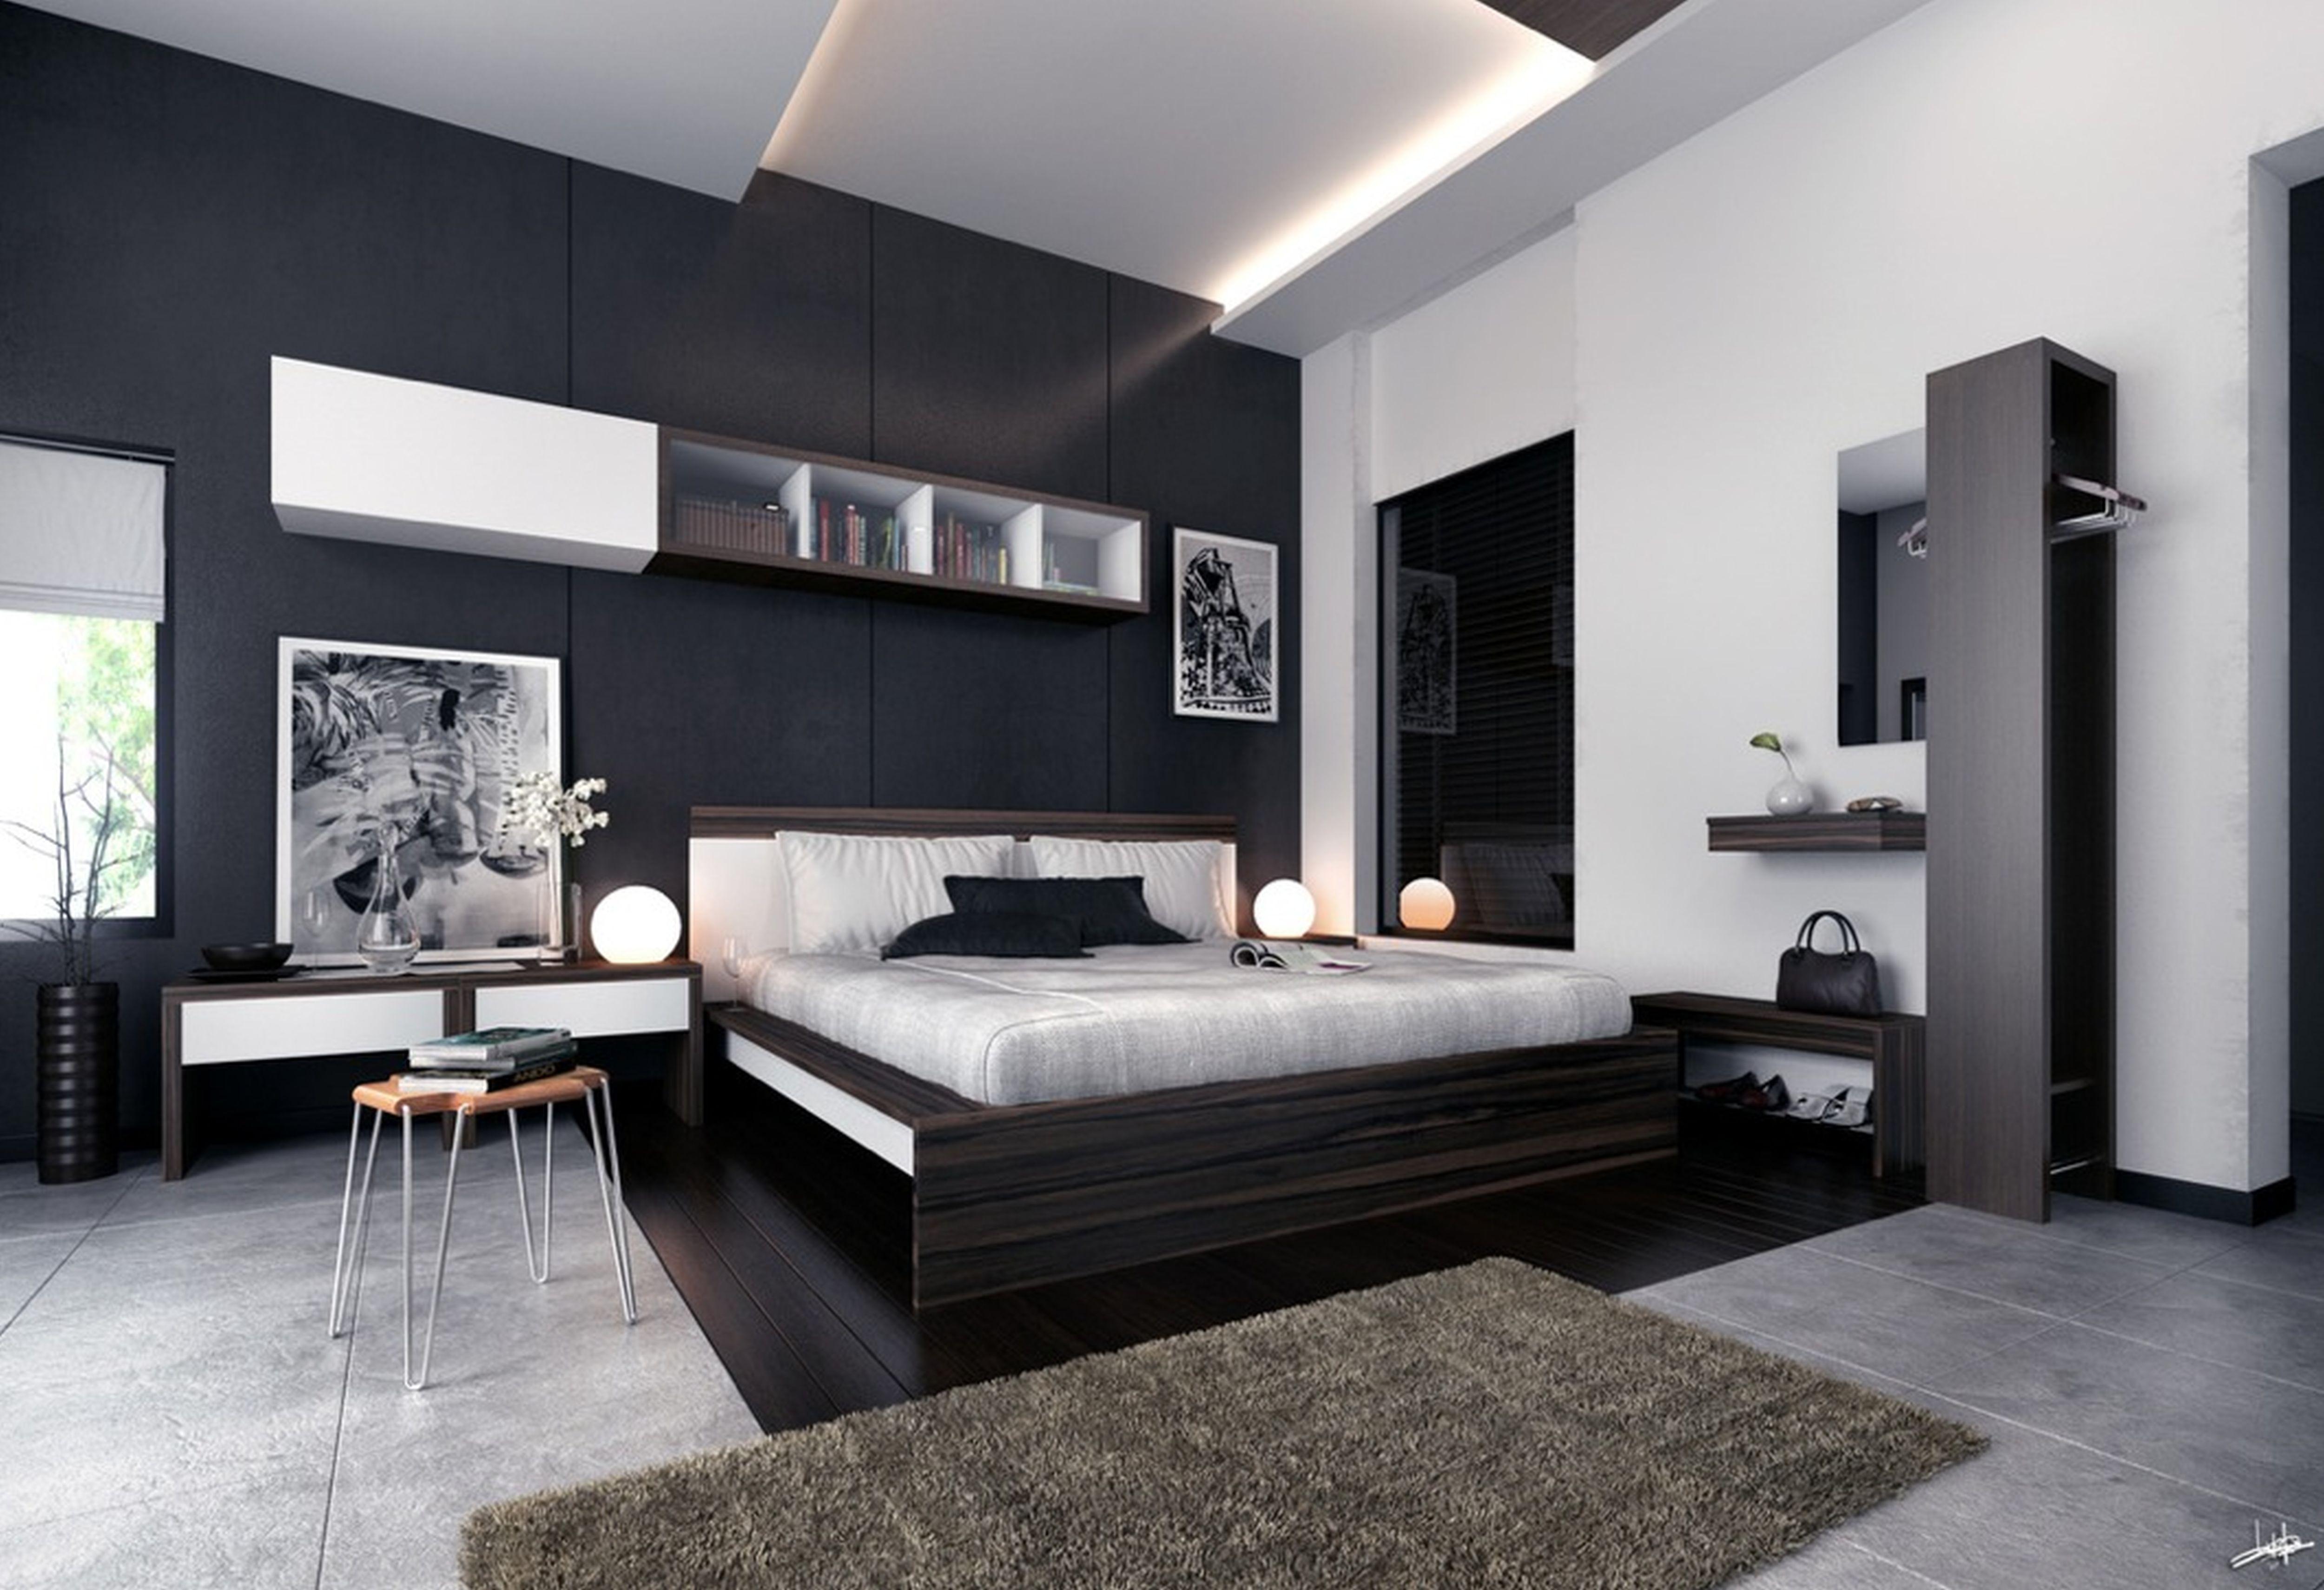 headboard modern black a bold pin houndstooth ethanallenbellevue and creates bedroom ethanallen vibe white fun